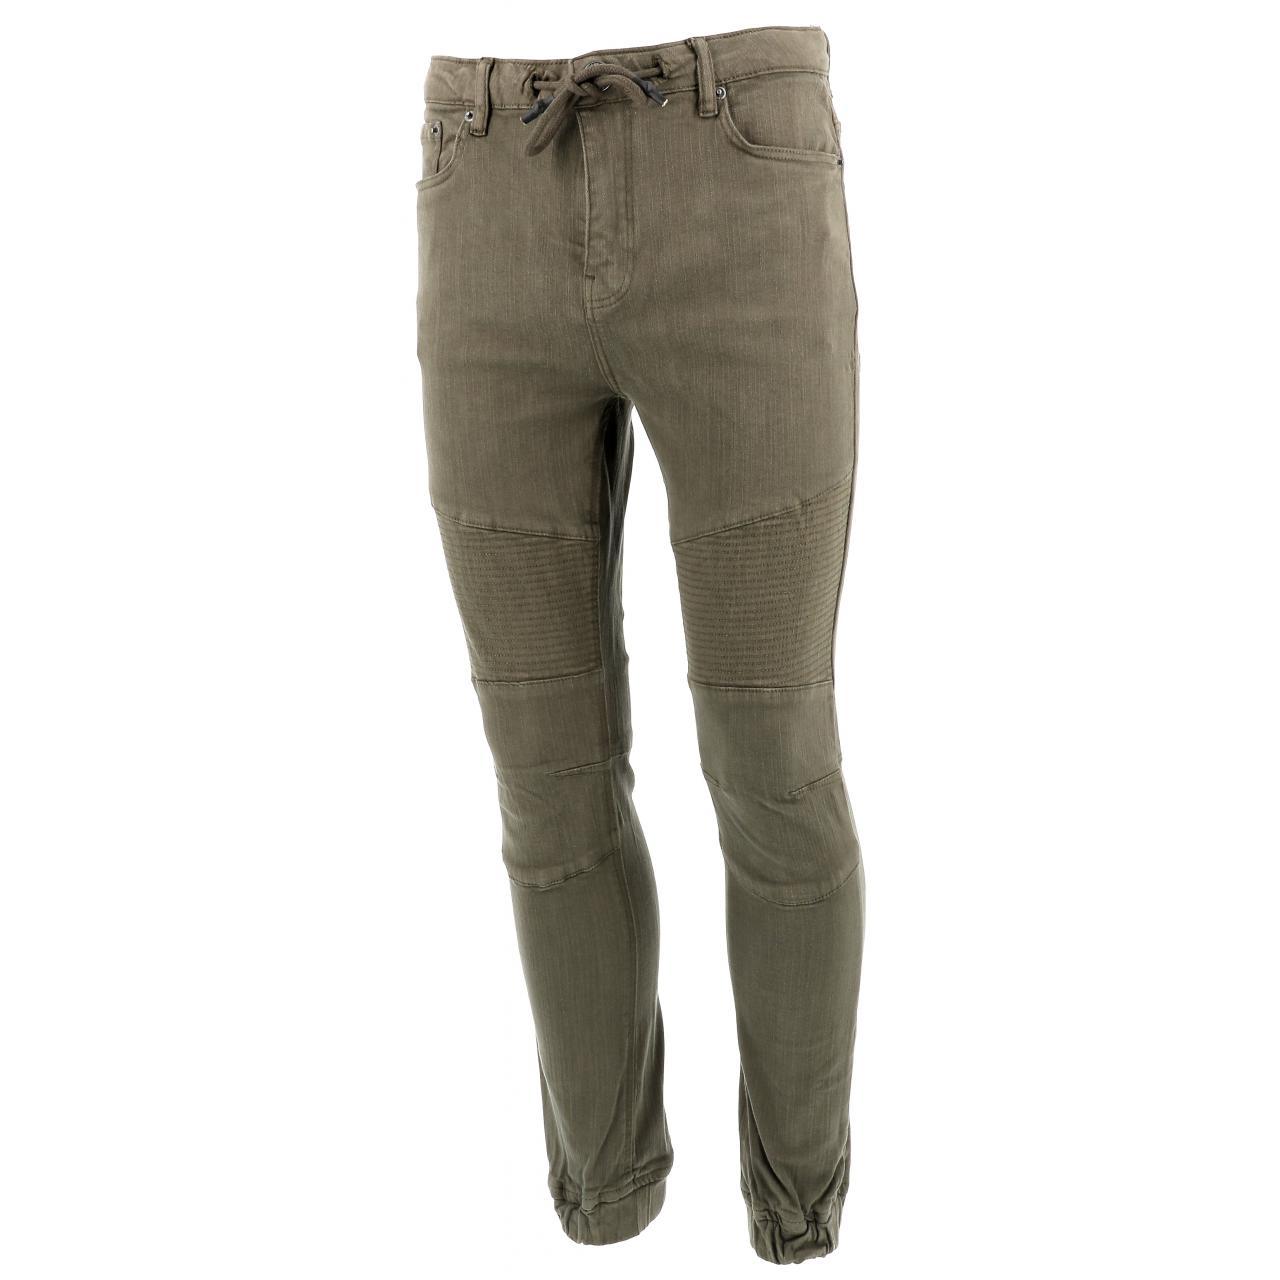 Jeans-Pants-Paname-brothers-Japa-Khaki-Jeans-Green-17196-New